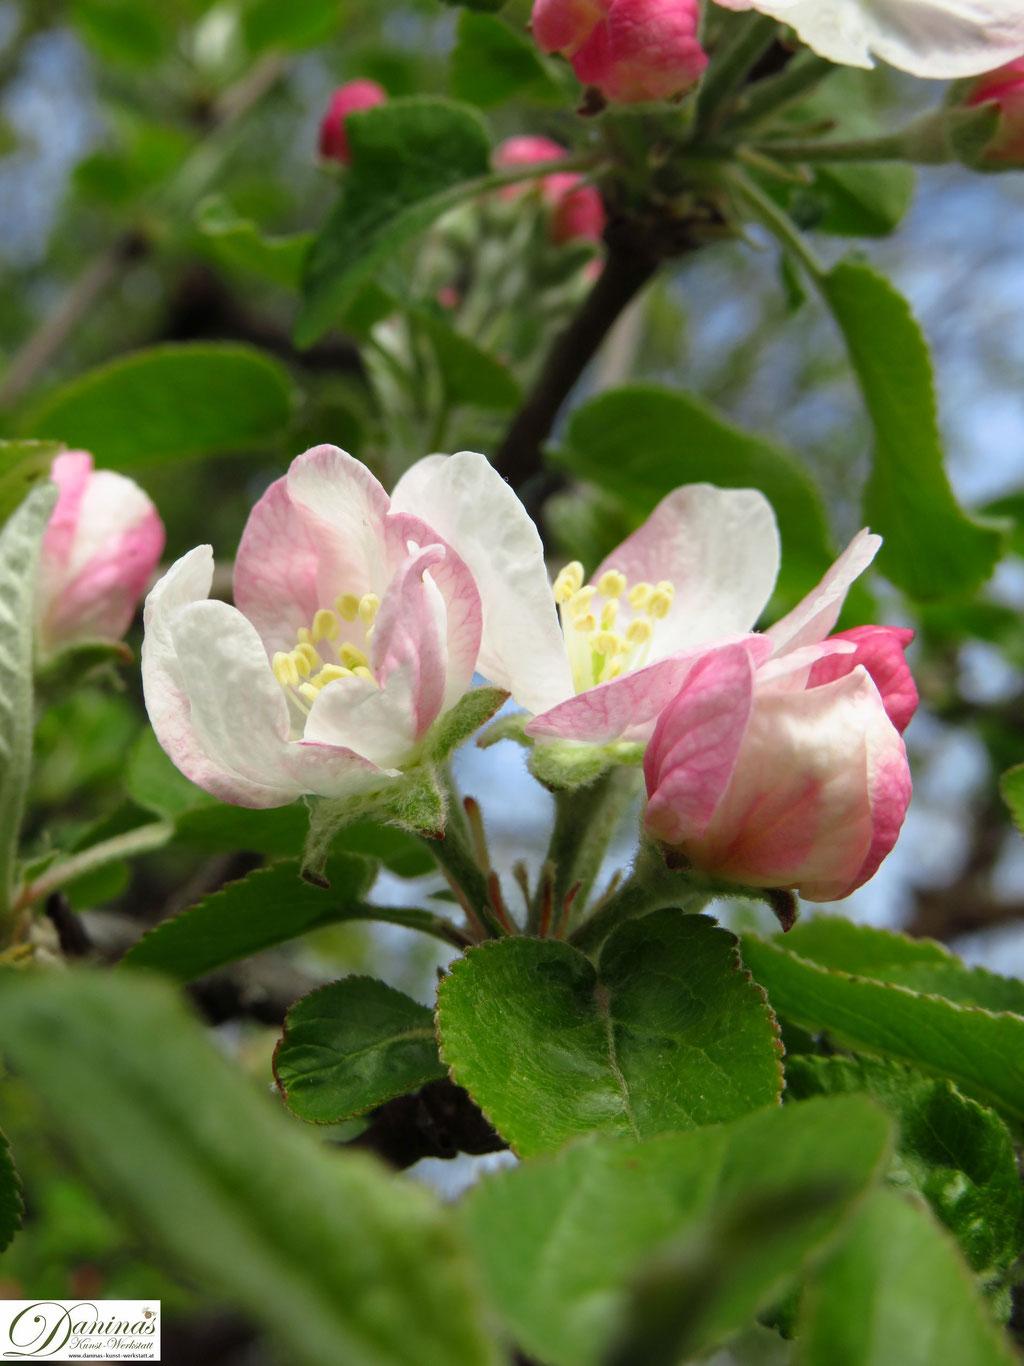 Apfelbaum - erste Blüten im Frühling